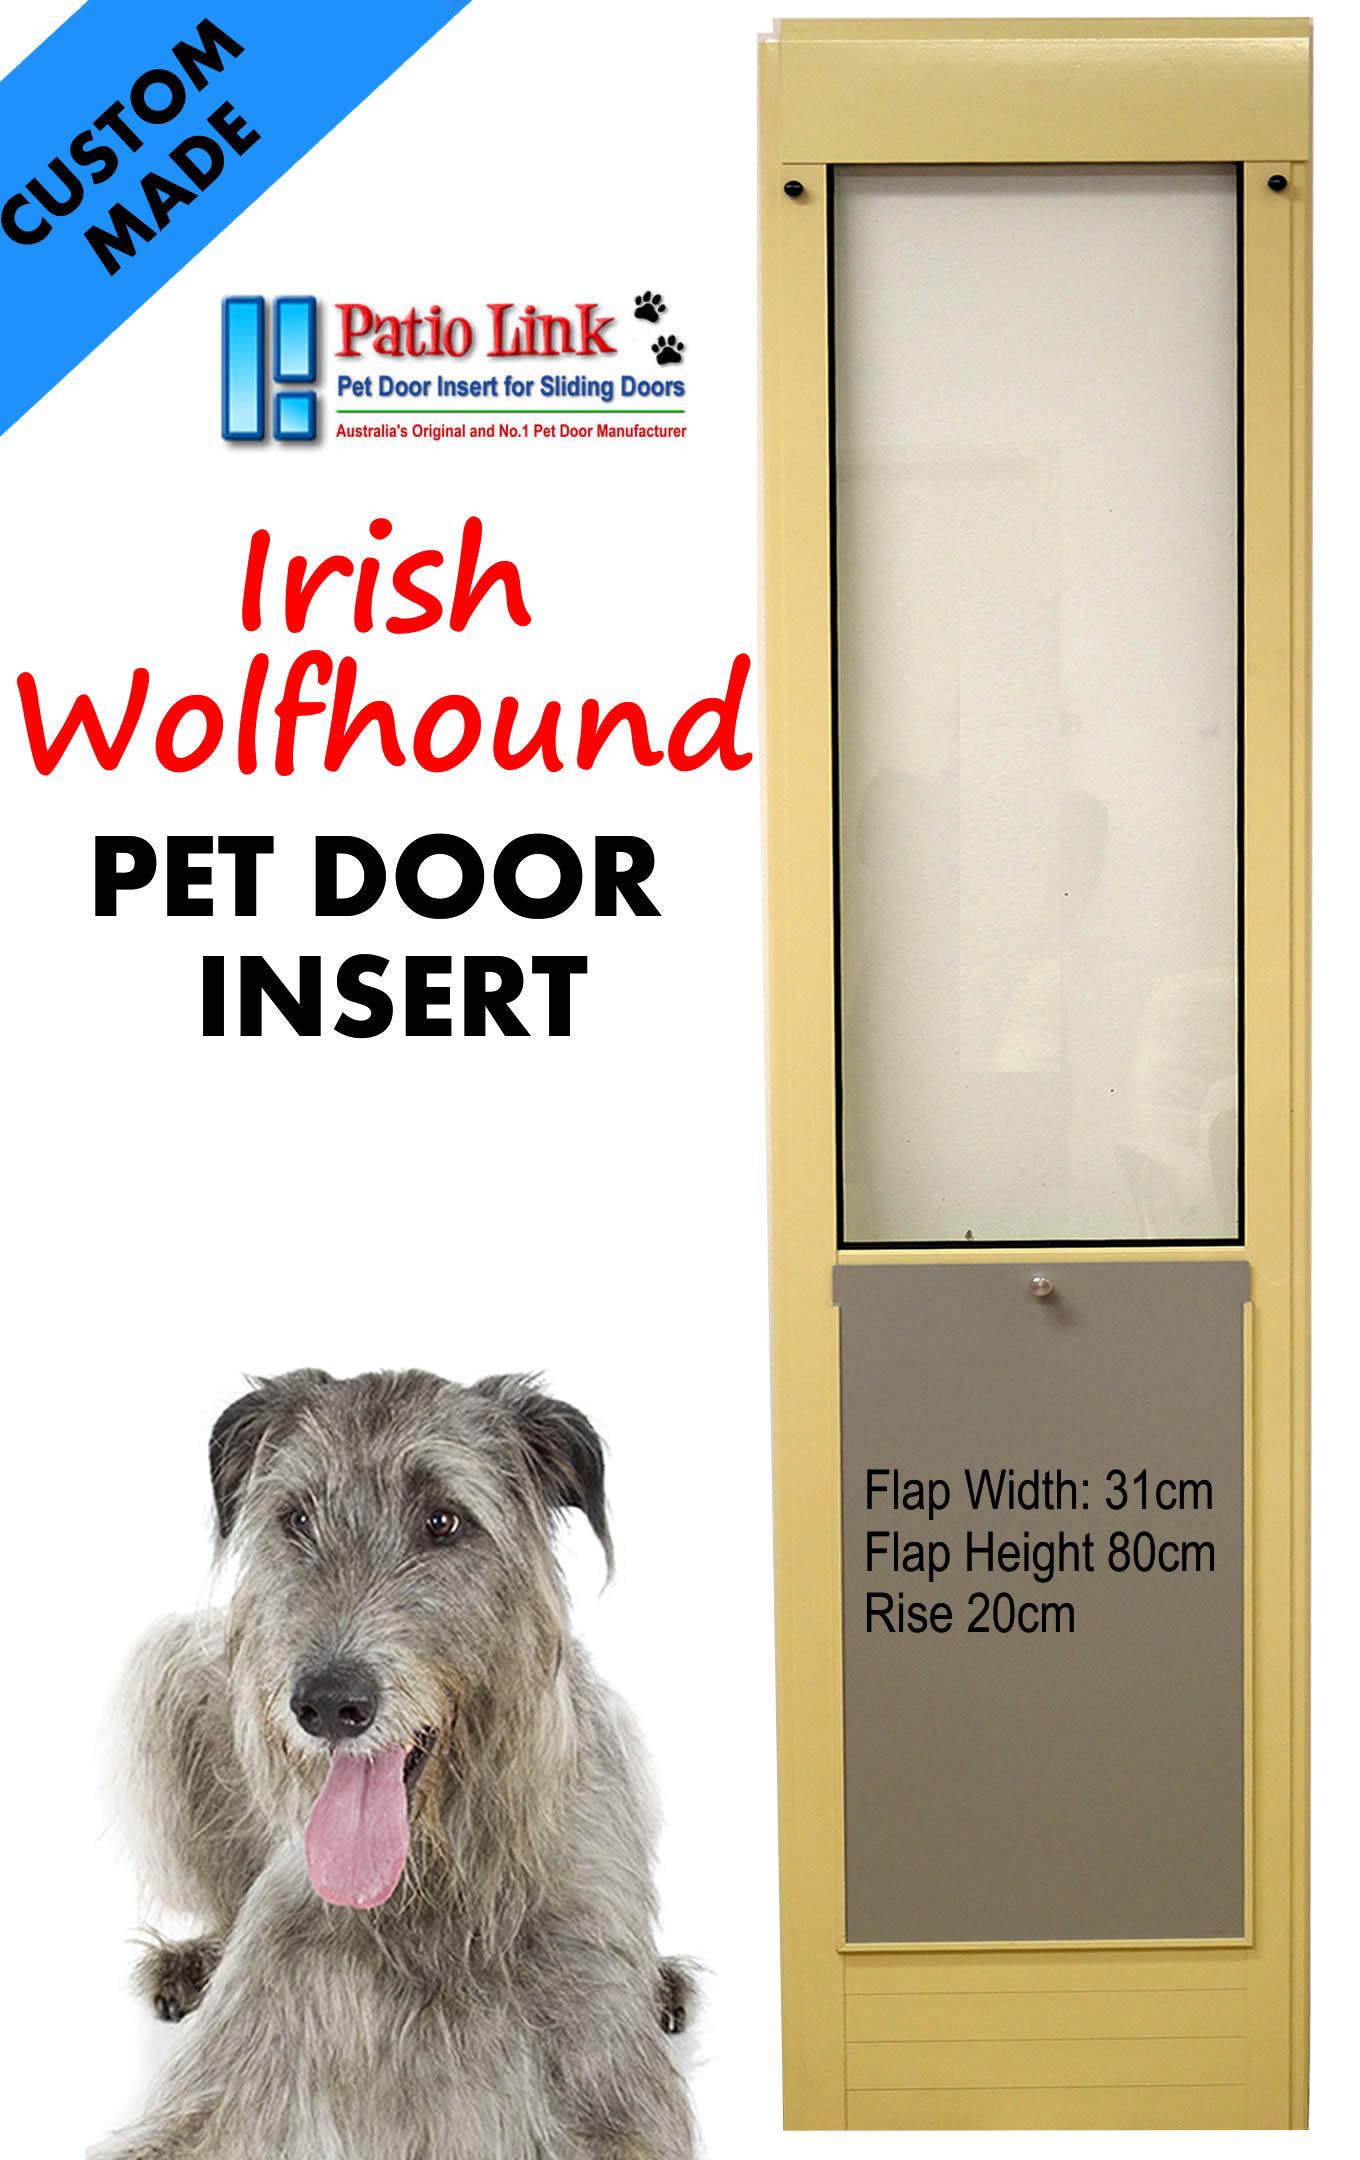 Irish Wolfhound Pet Door Inset